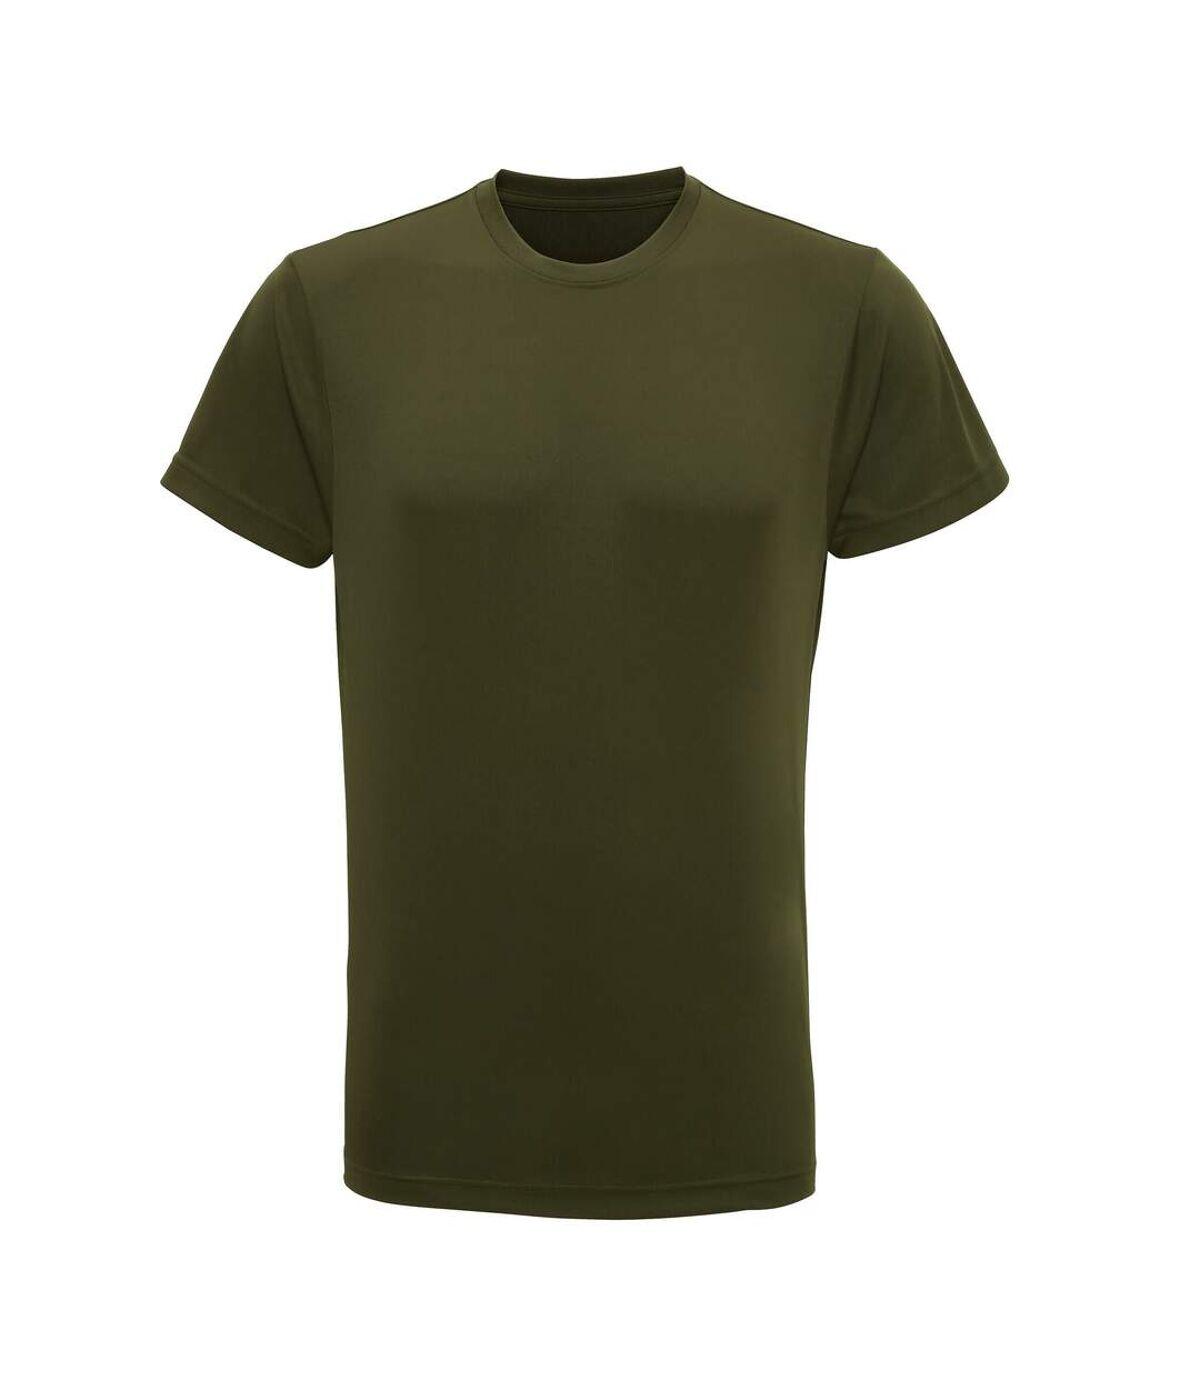 Tri Dri Mens Short Sleeve Lightweight Fitness T-Shirt (Olive) - UTRW4798